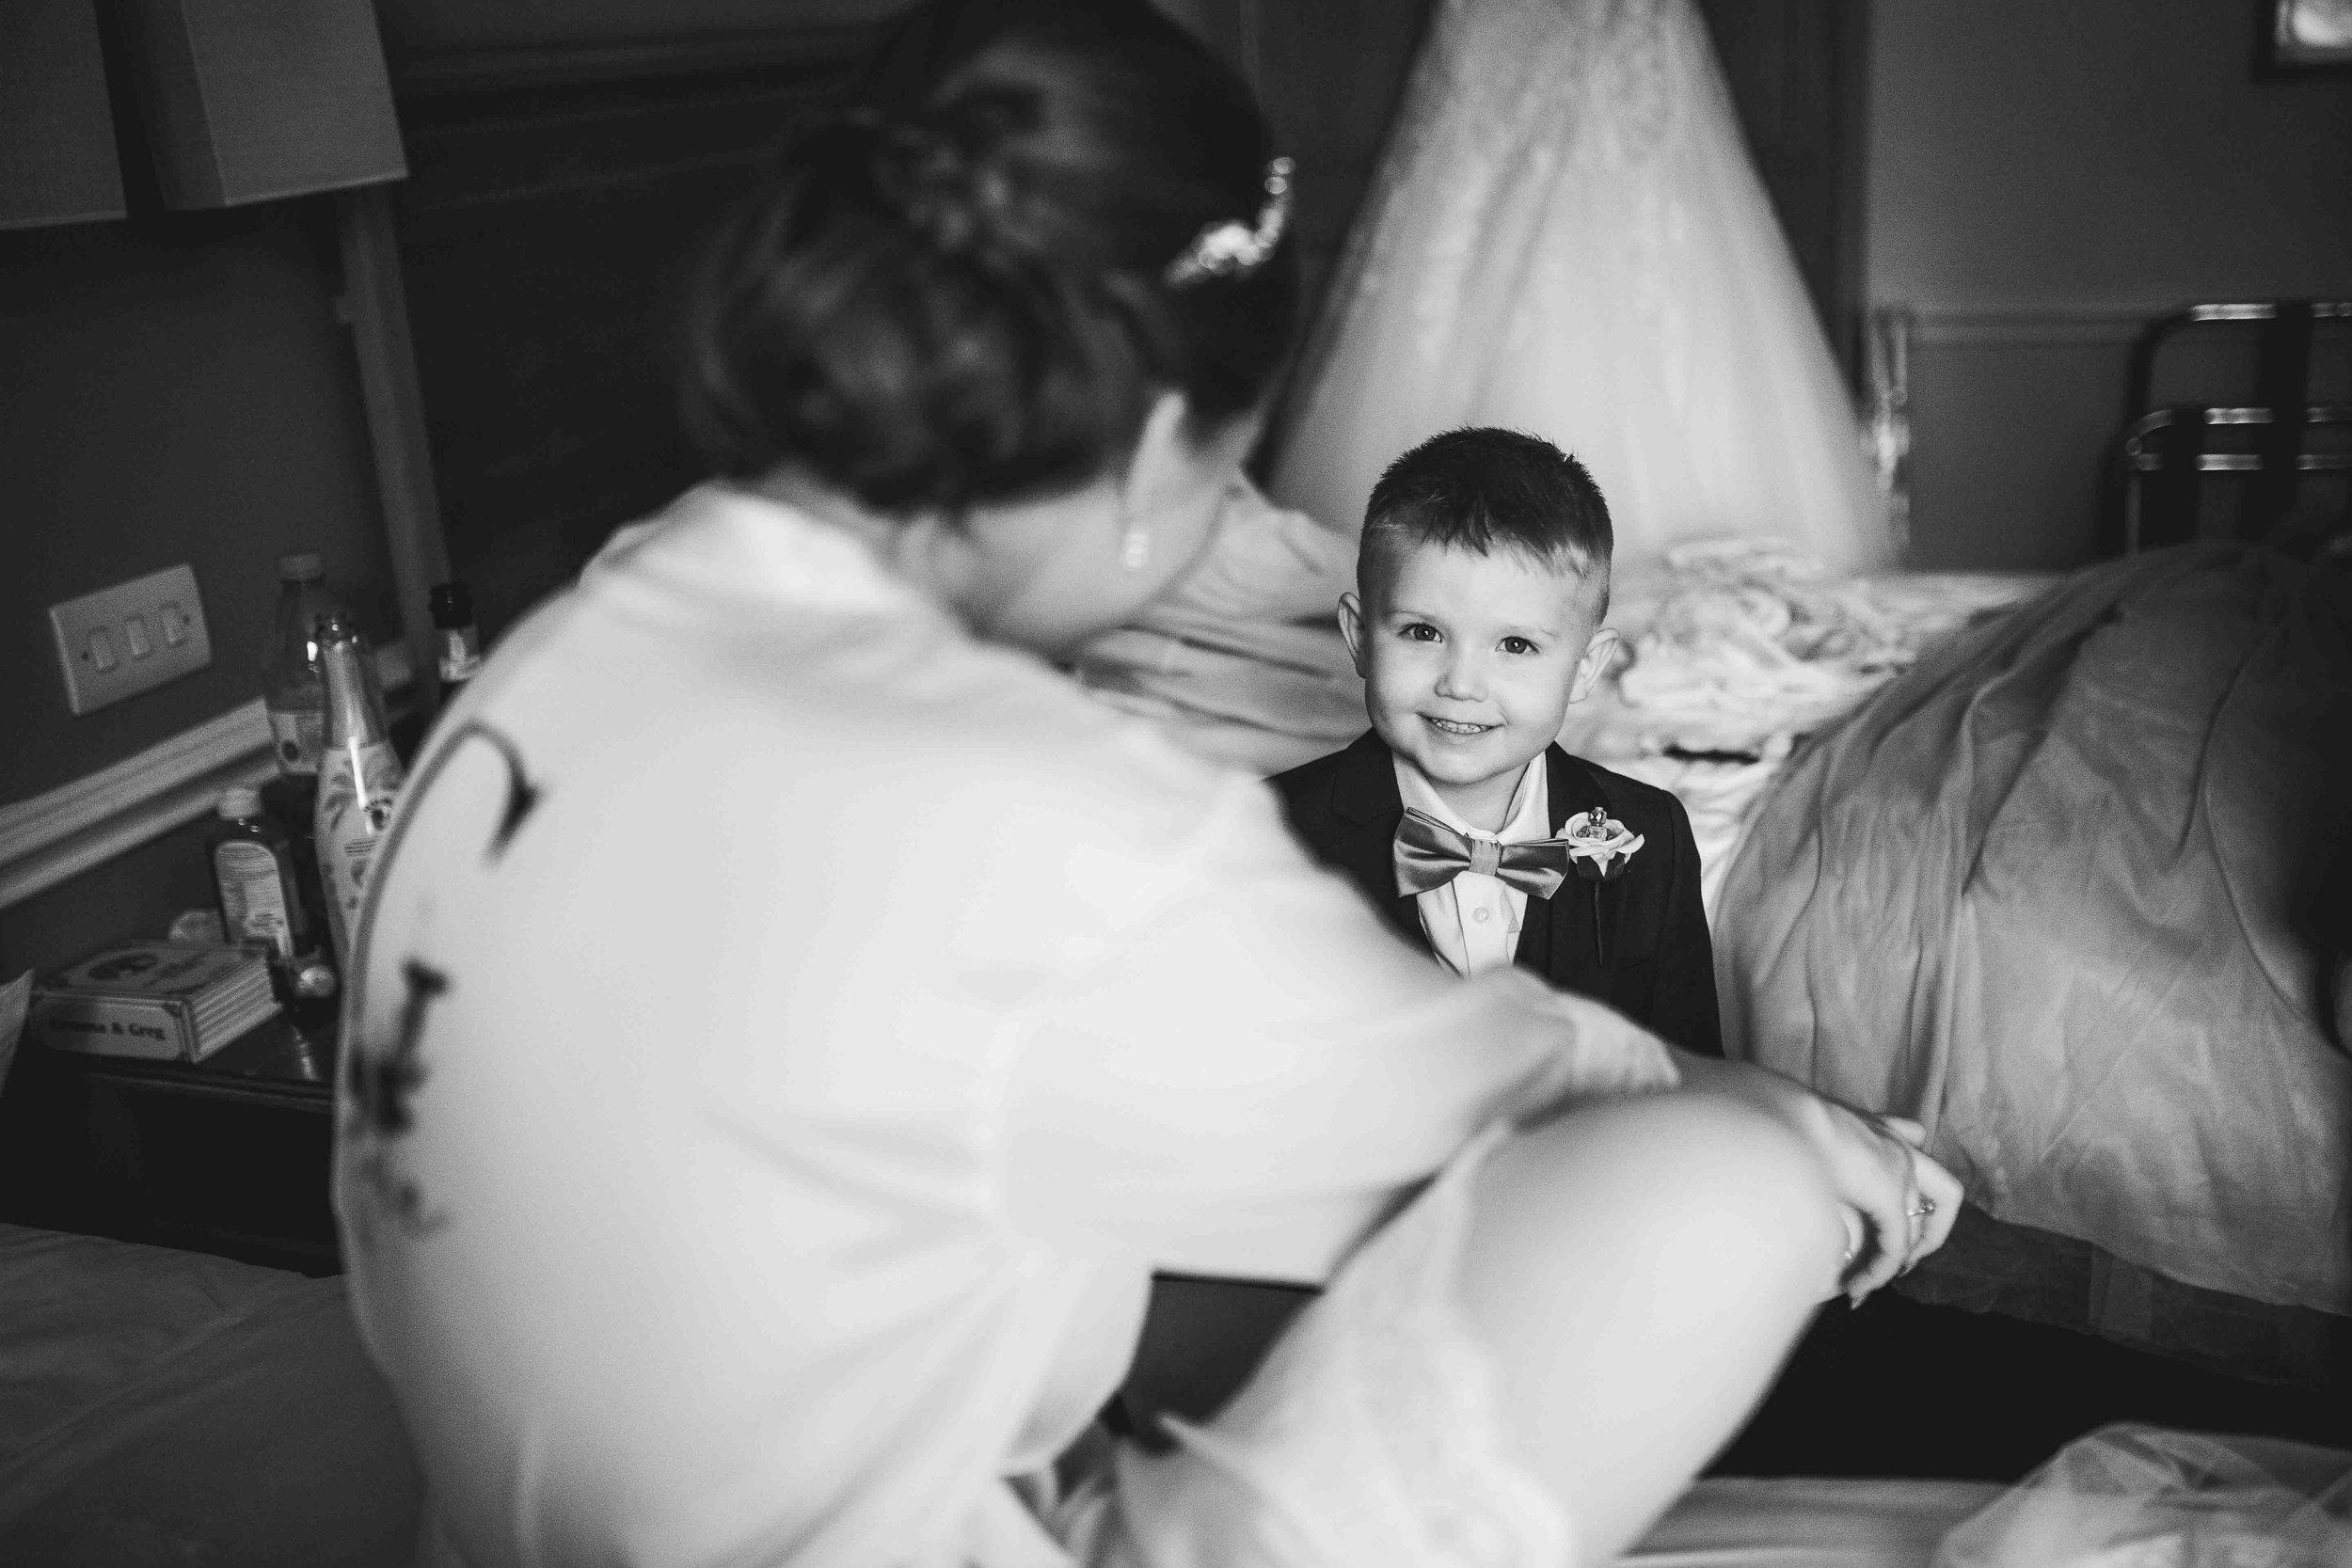 Lea-cooper-photography-willenhall-wolverhampton-wedding-photographer-birmingham-shirley-west-midlands-ceremony-church-5.JPG